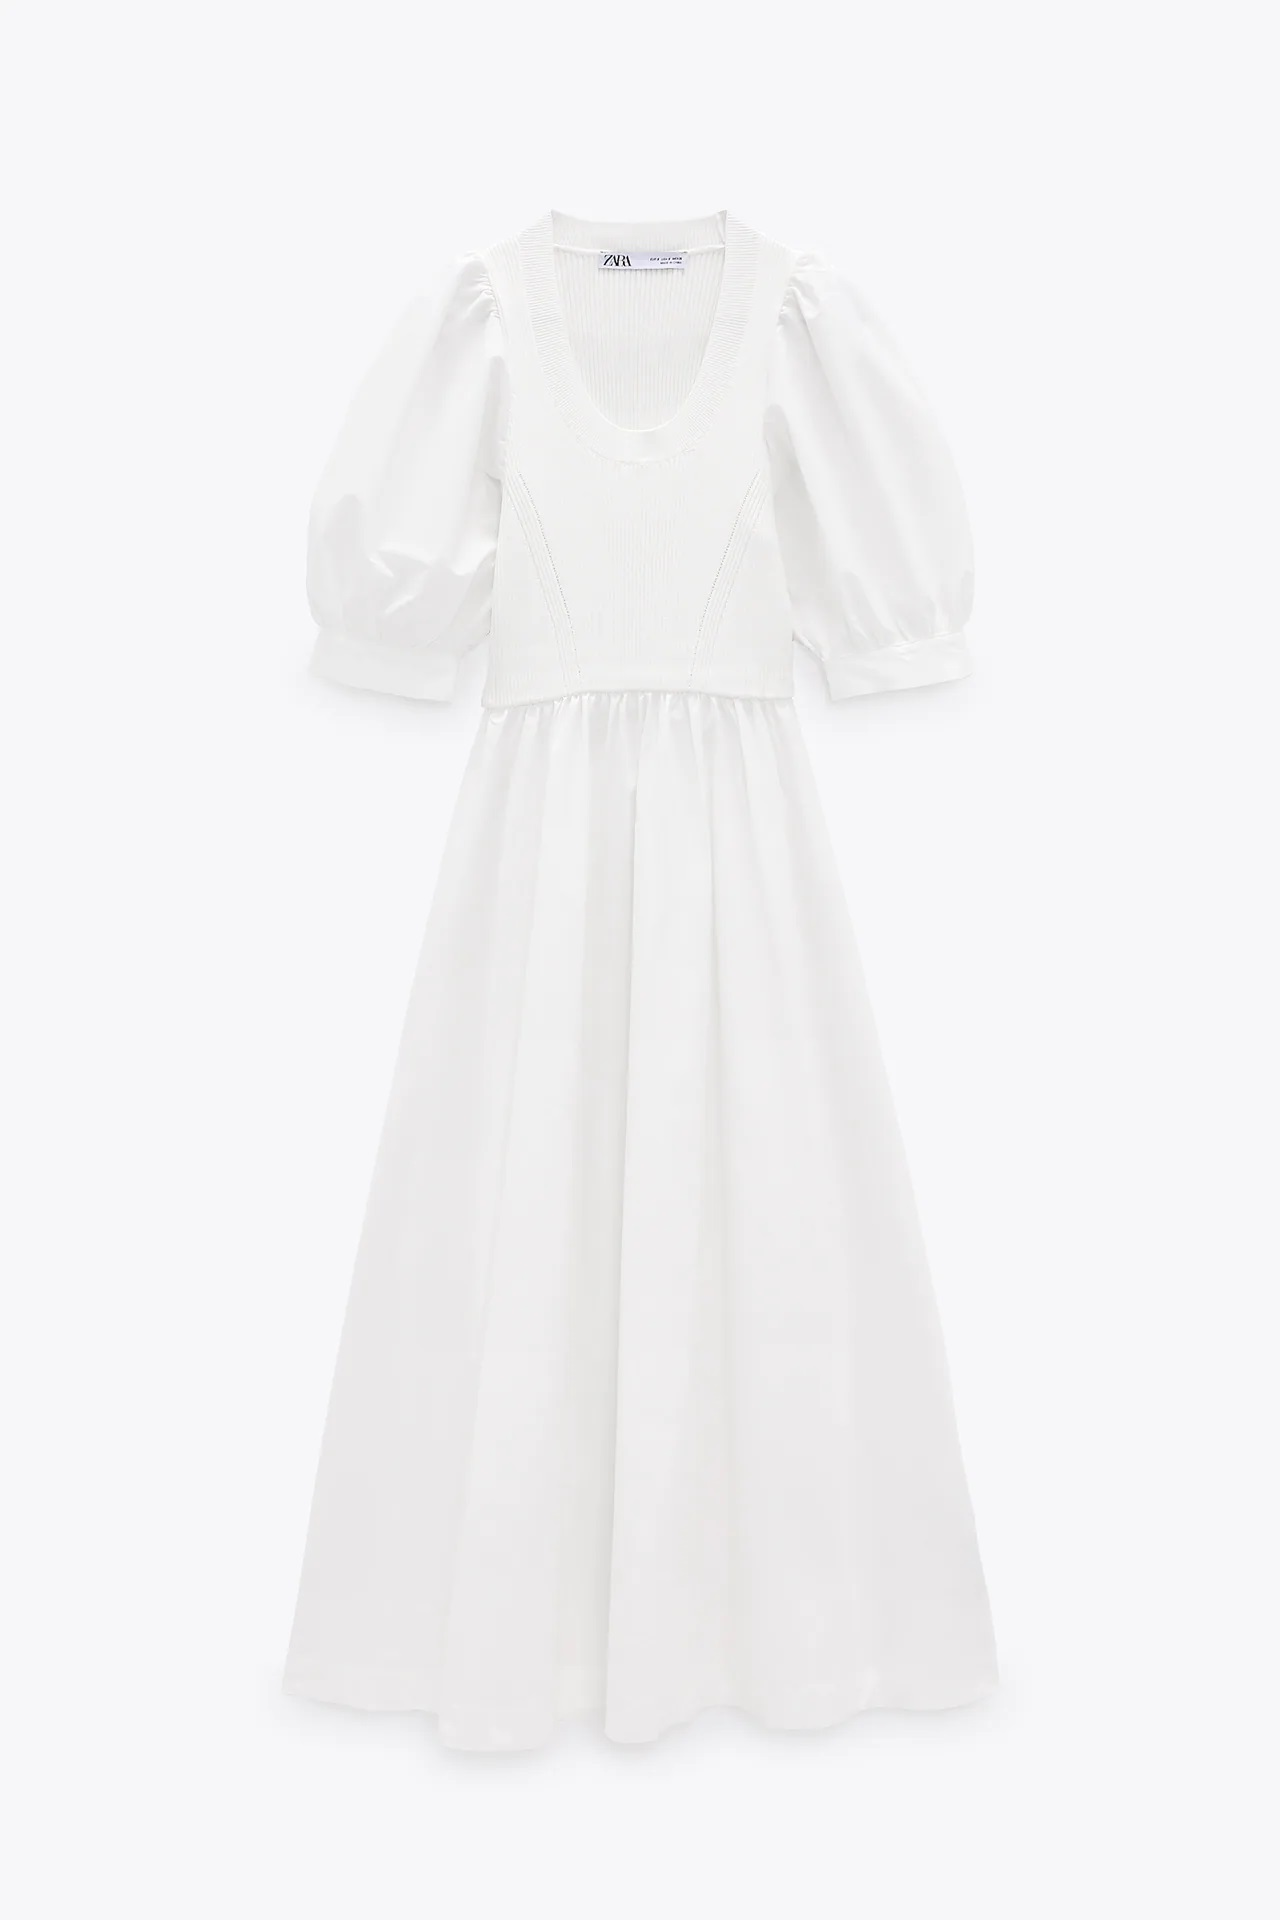 Cásate con Zara, 6 vestidos de novia low cost por menos de 50 euros